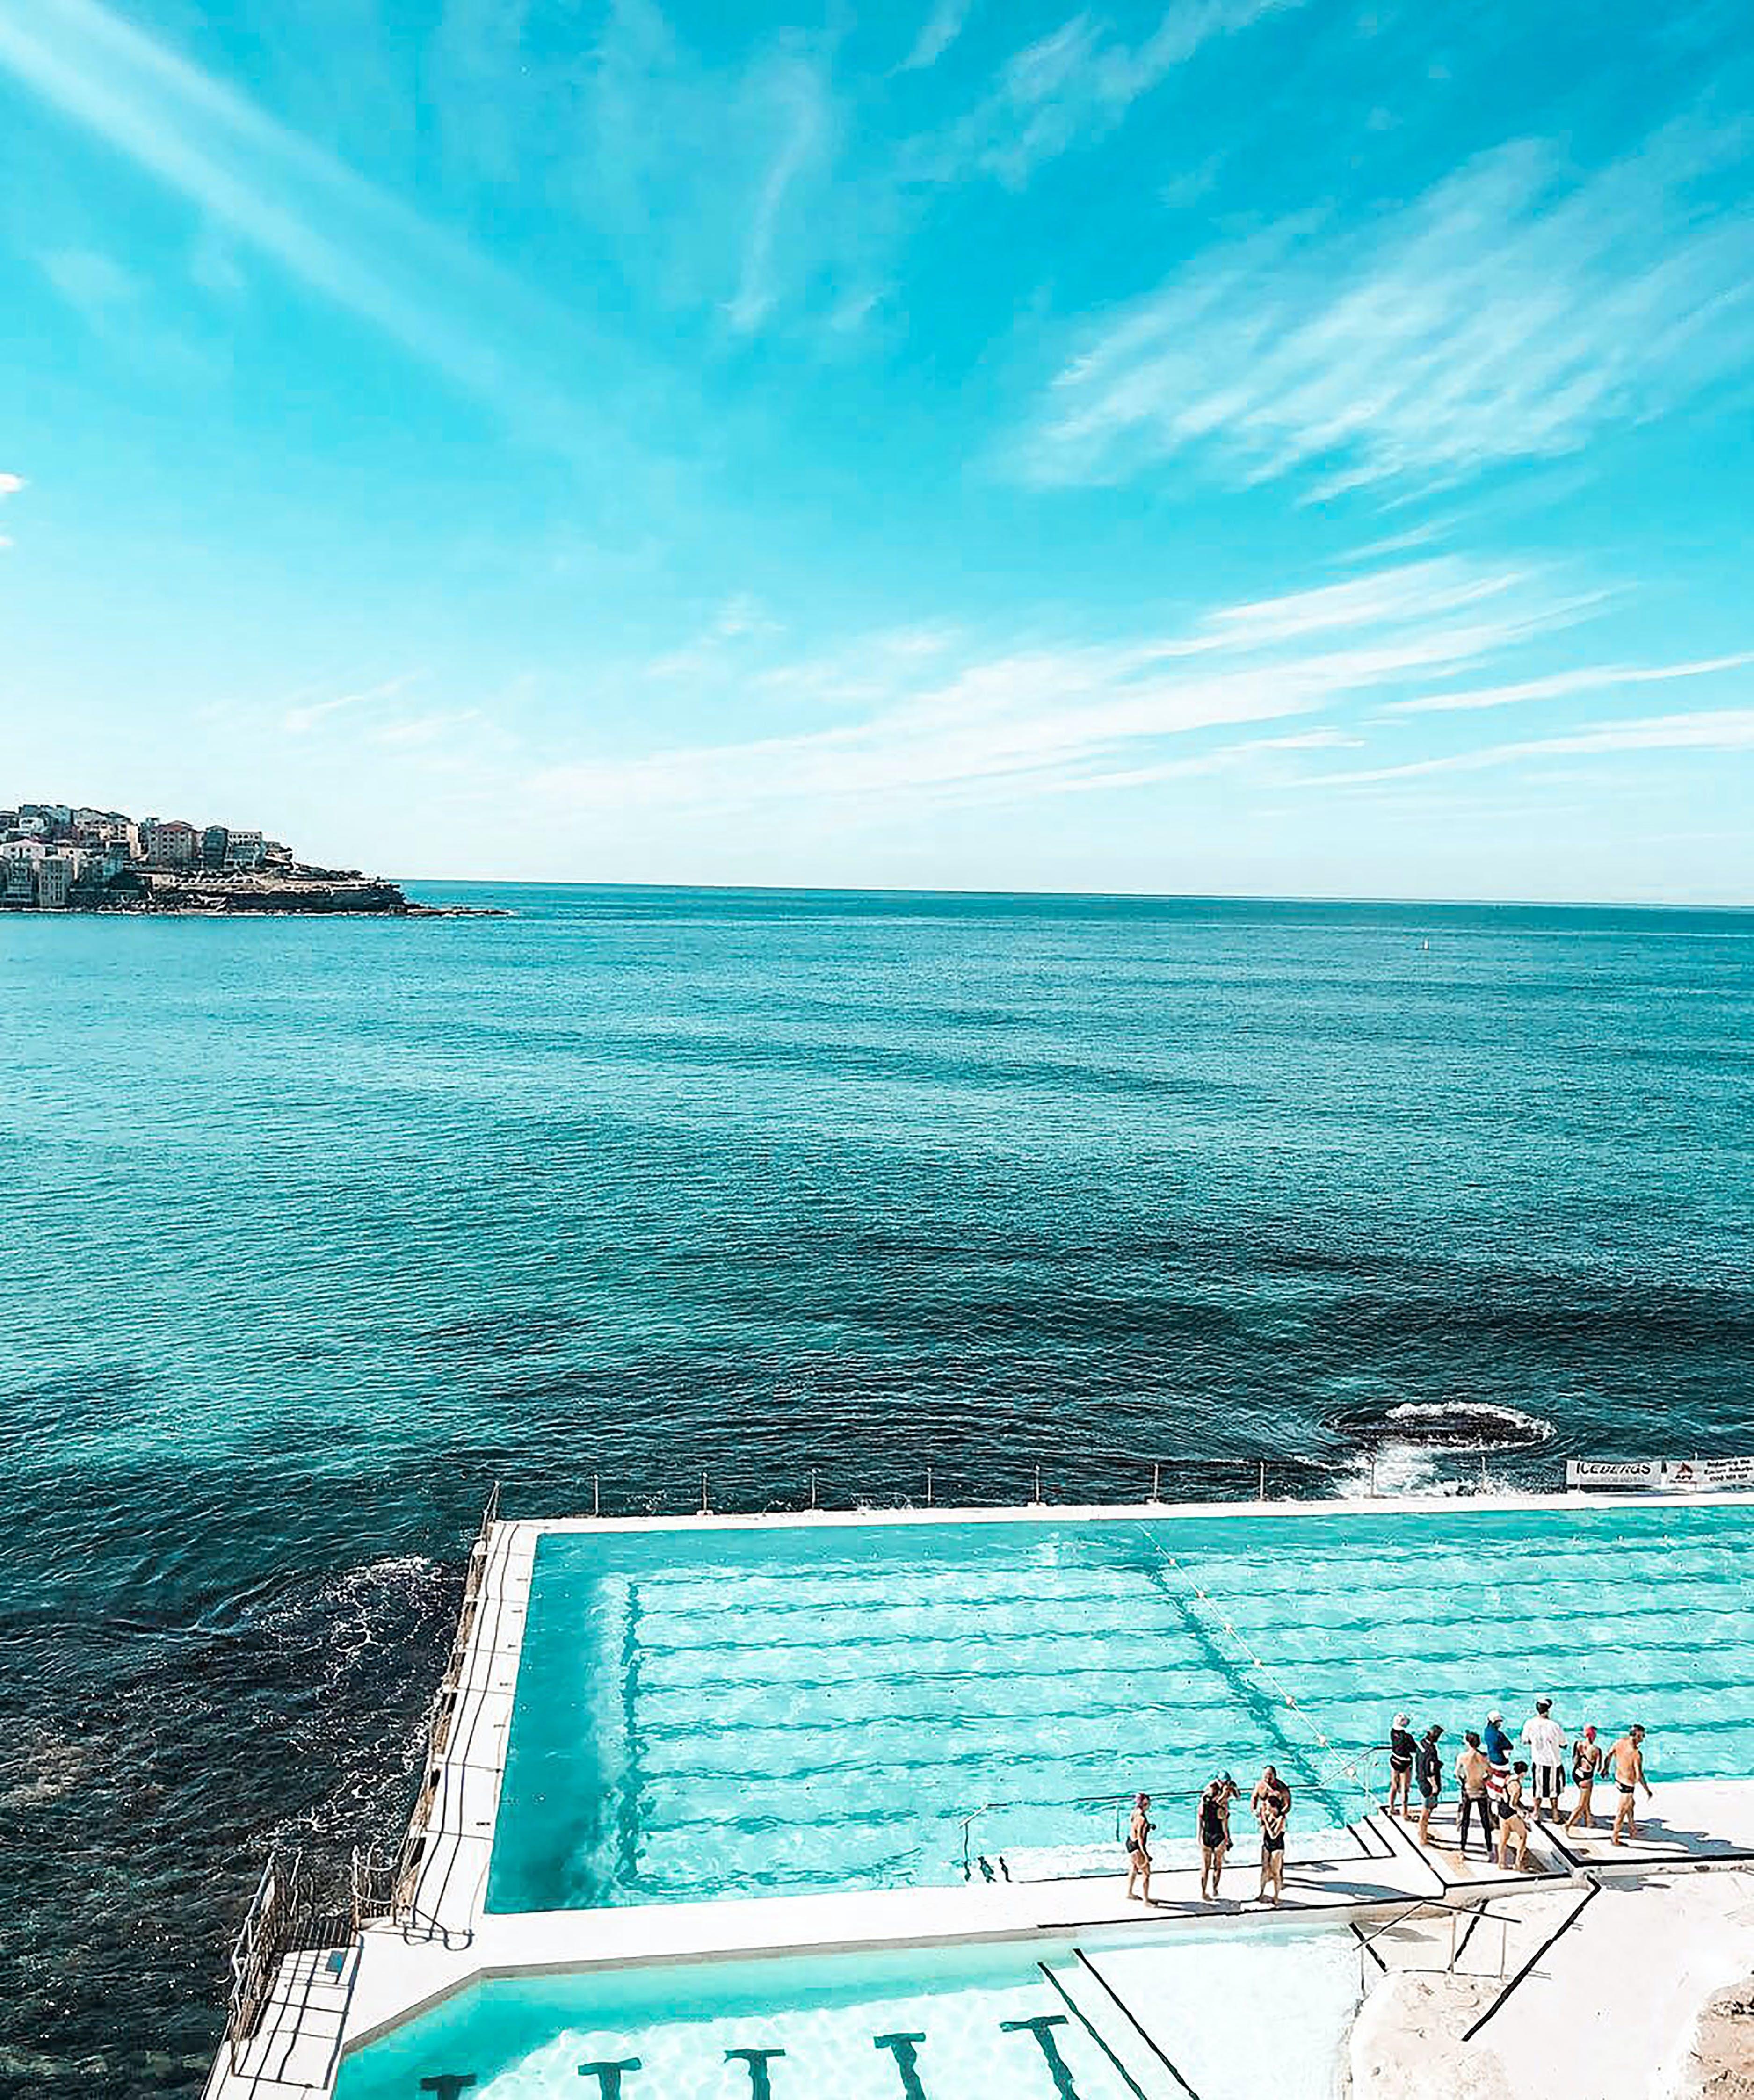 Kostenloses Stock Foto zu australien, baden, badeort, bondi beach